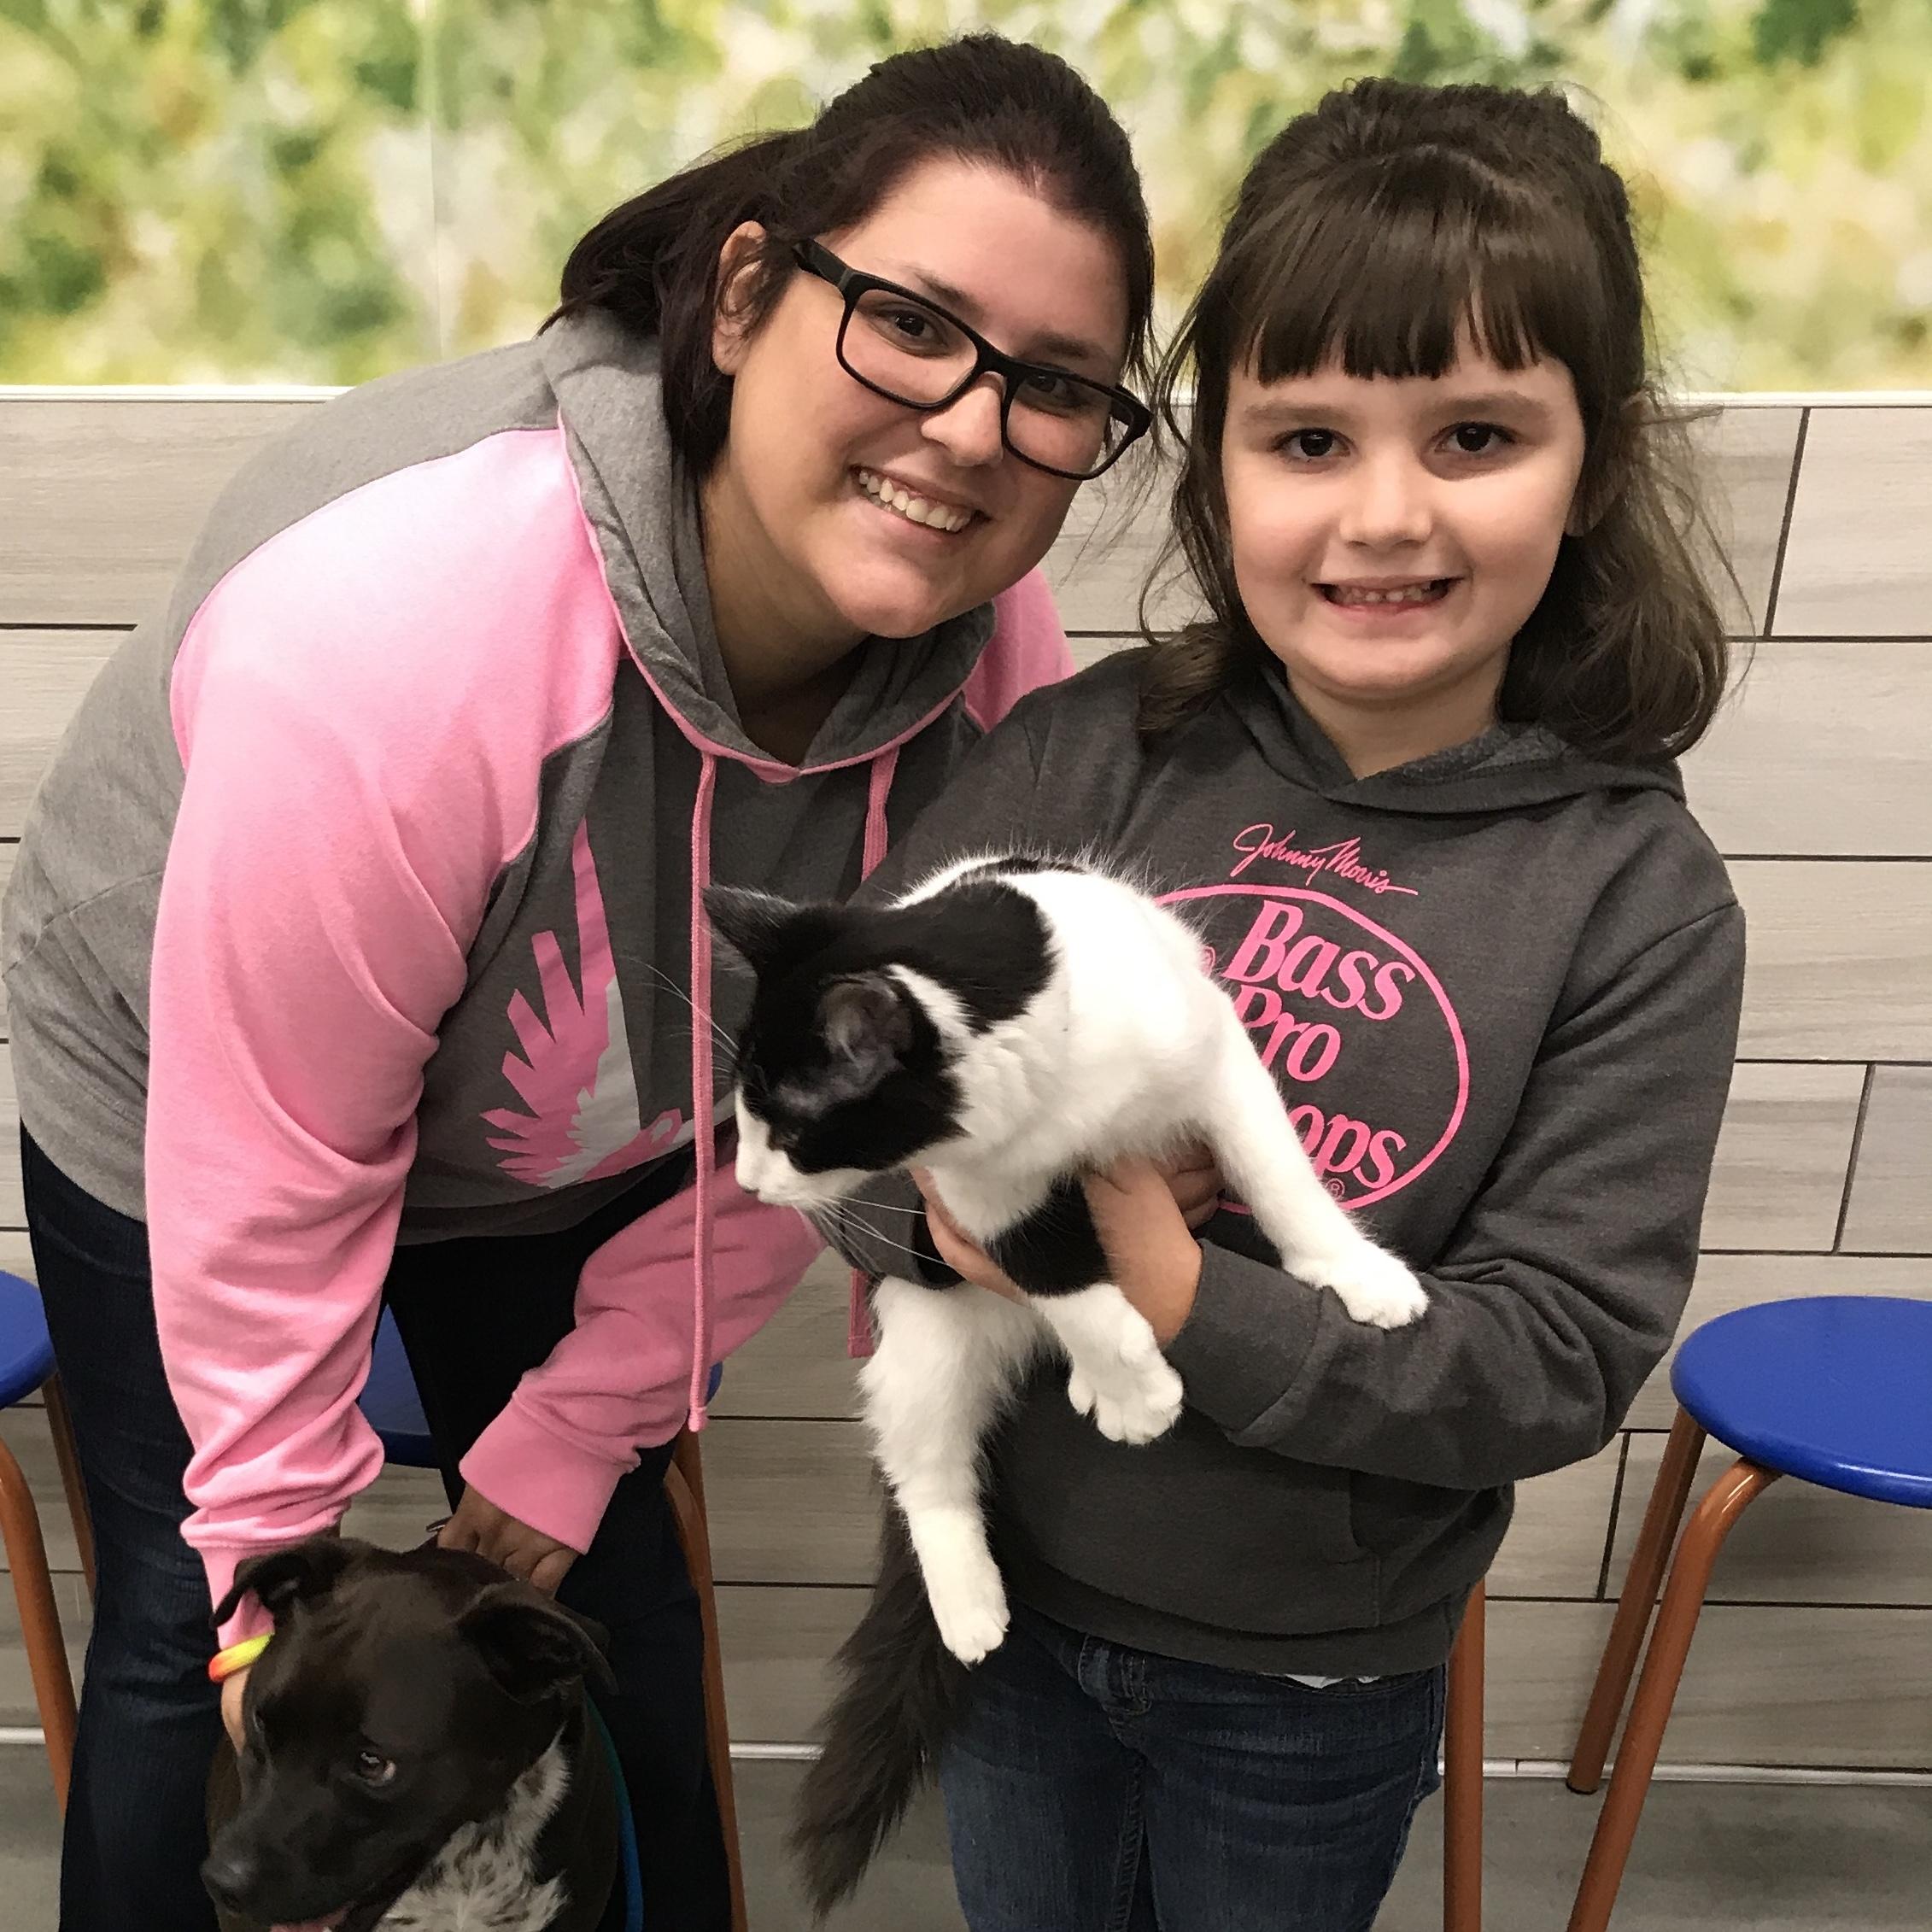 DONATELLO - Adopted December 2017